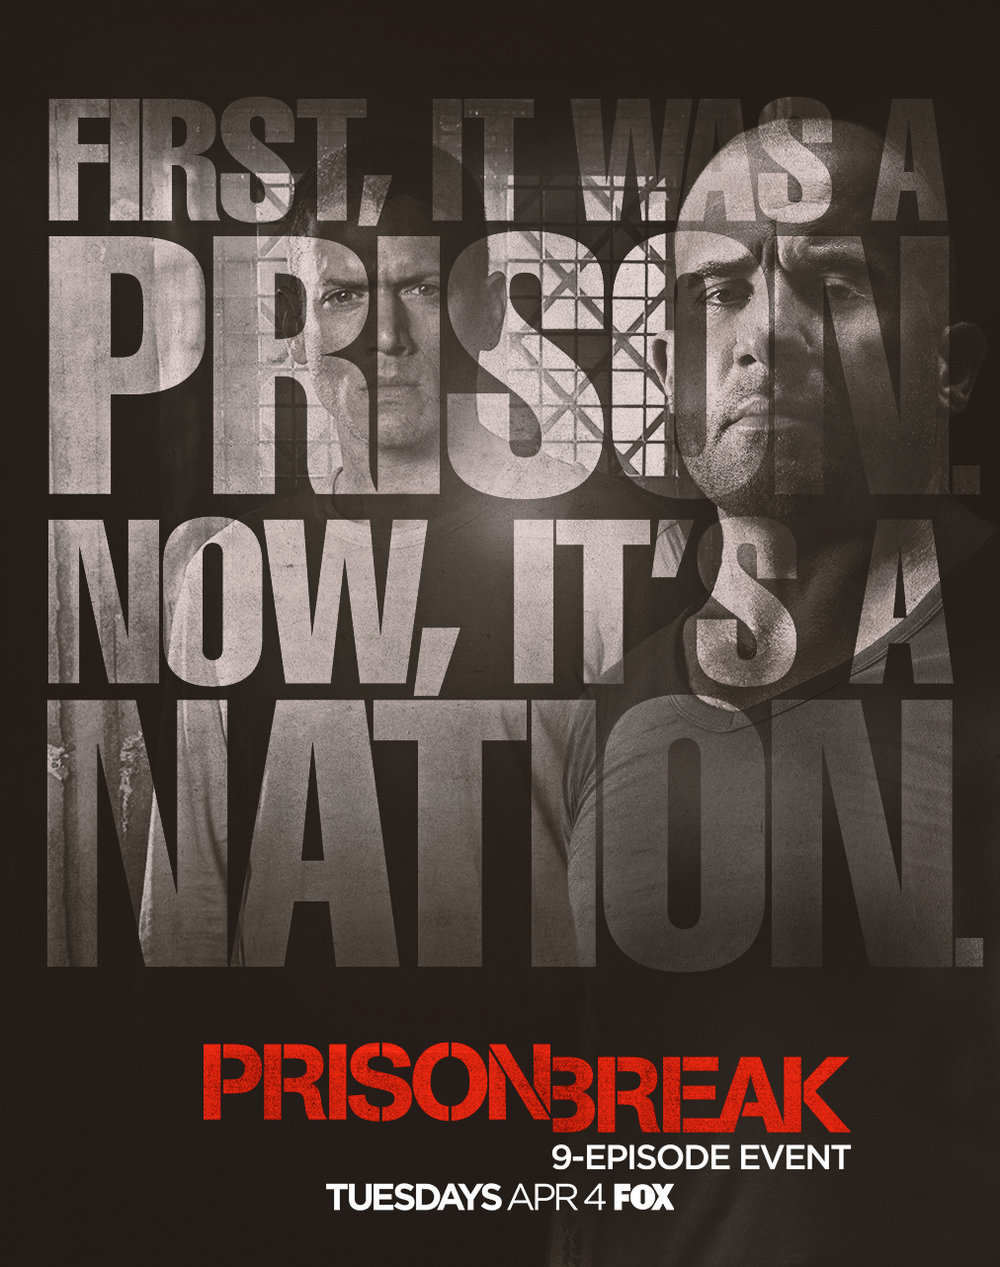 PrisonBreak_Poster_4_FB.jpg